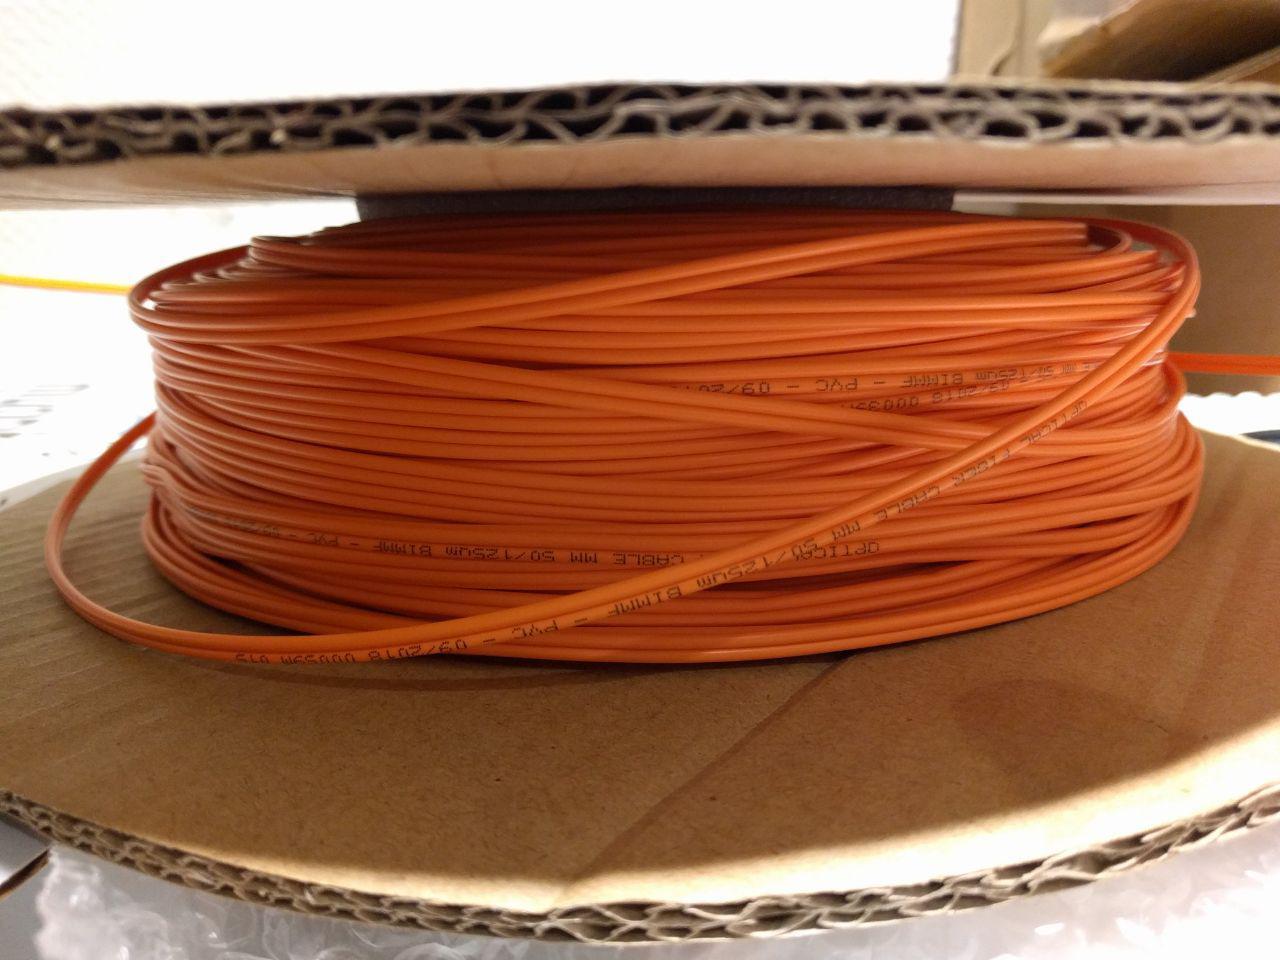 150m of LWL-patch cable LC UPC to LC UPC Duplex plug OM2 Multimode PVC (OFNR) 2.0mm fibre optic data cable https://www.fs.com/de/products/74394.html